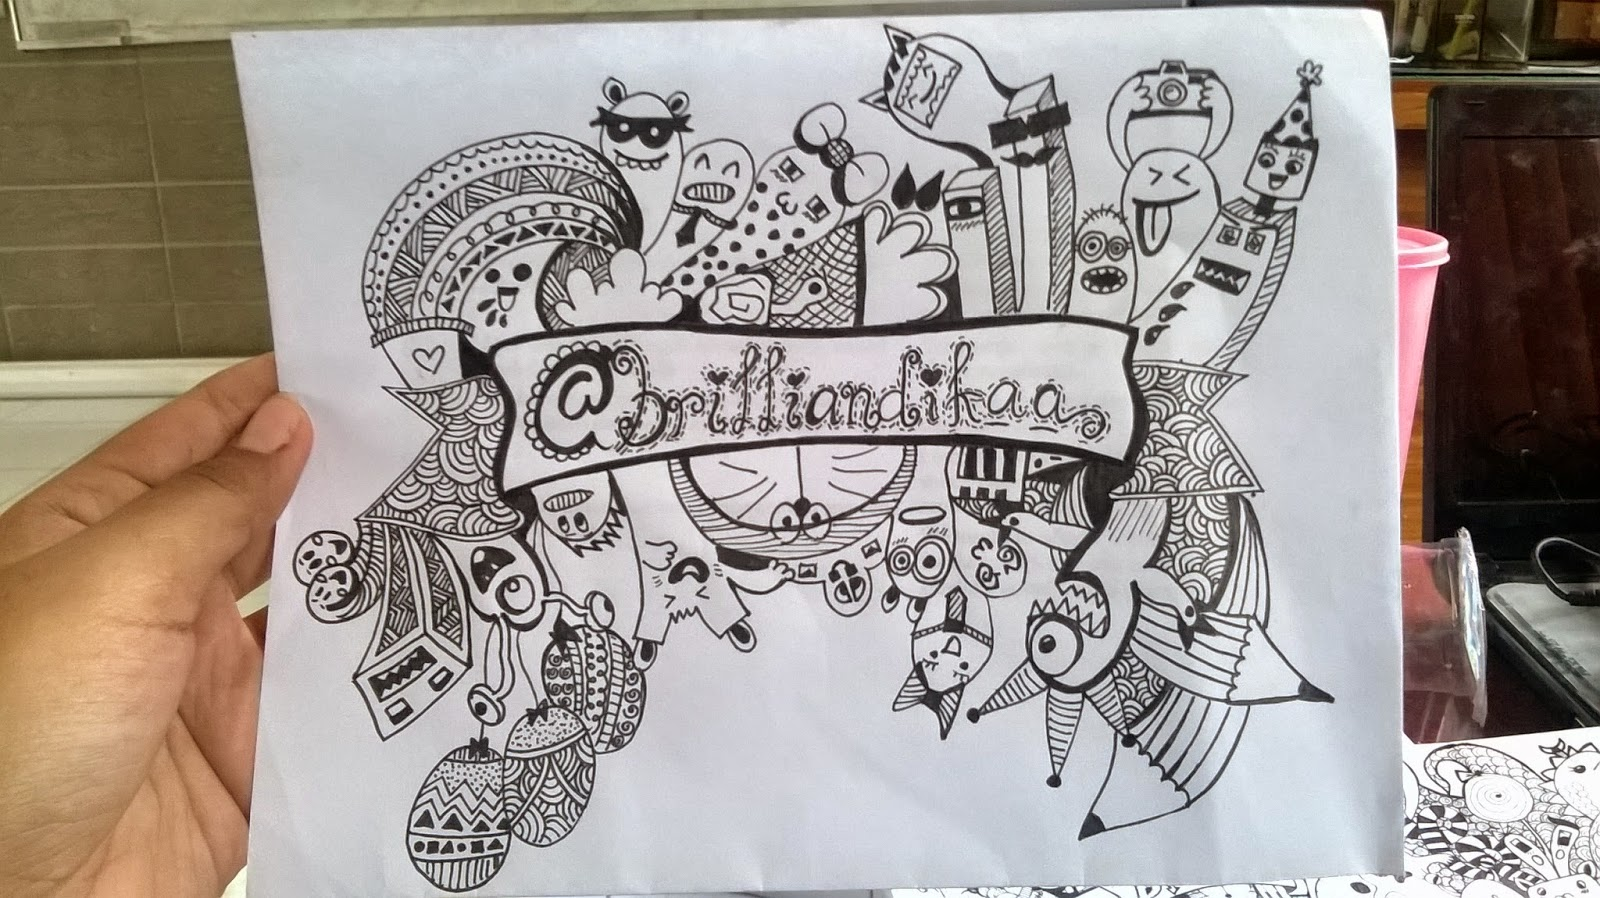 Contoh Gambar Doodle Nama Sederhana Kantor Meme